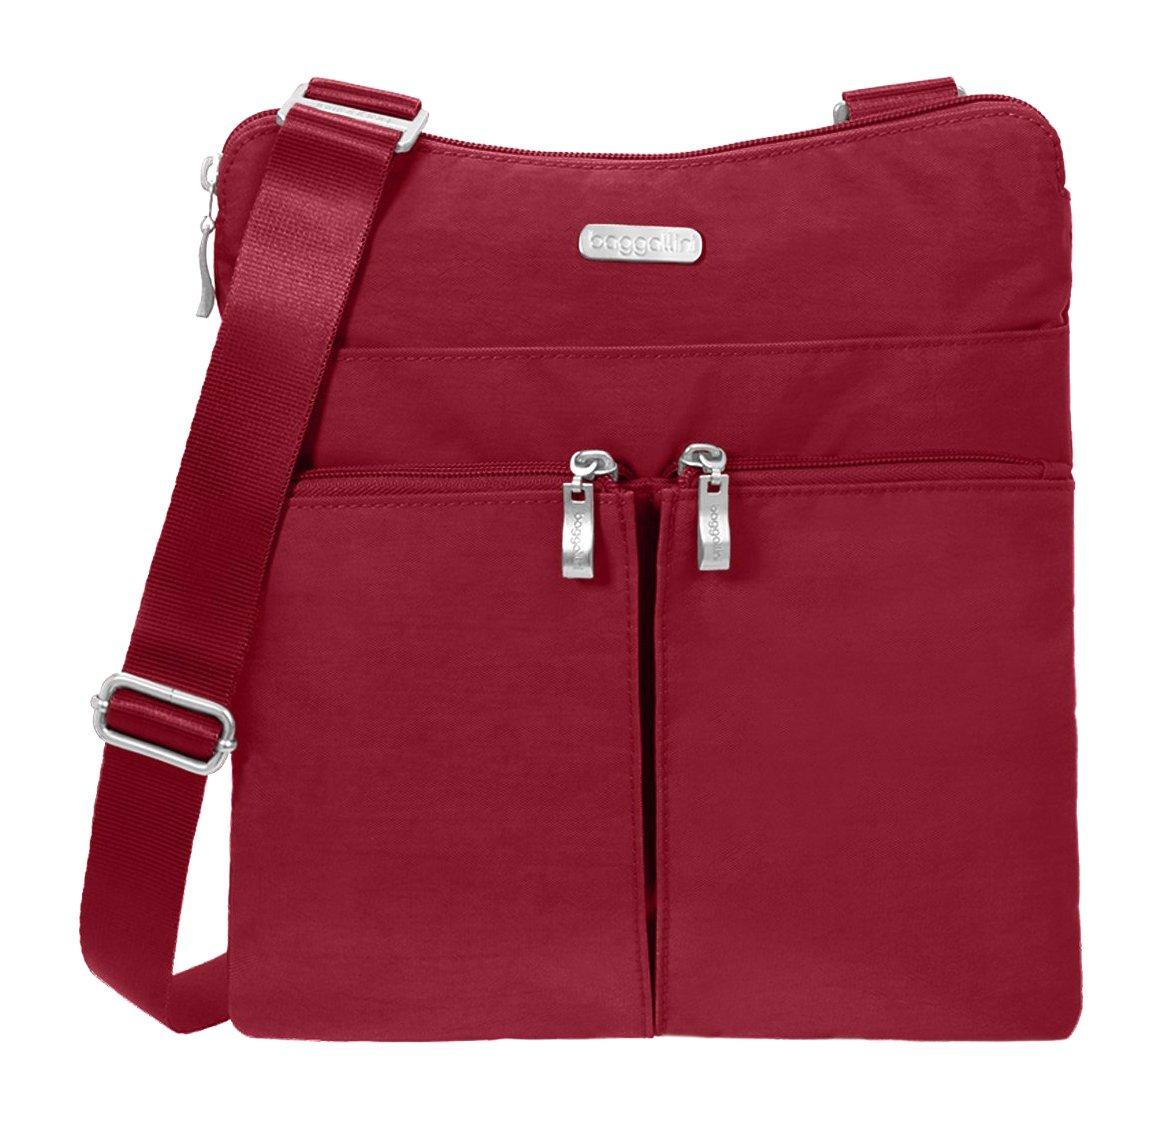 Baggallini Horizon Crossbody Travel Bag Apple One Size HRZ649-B0614